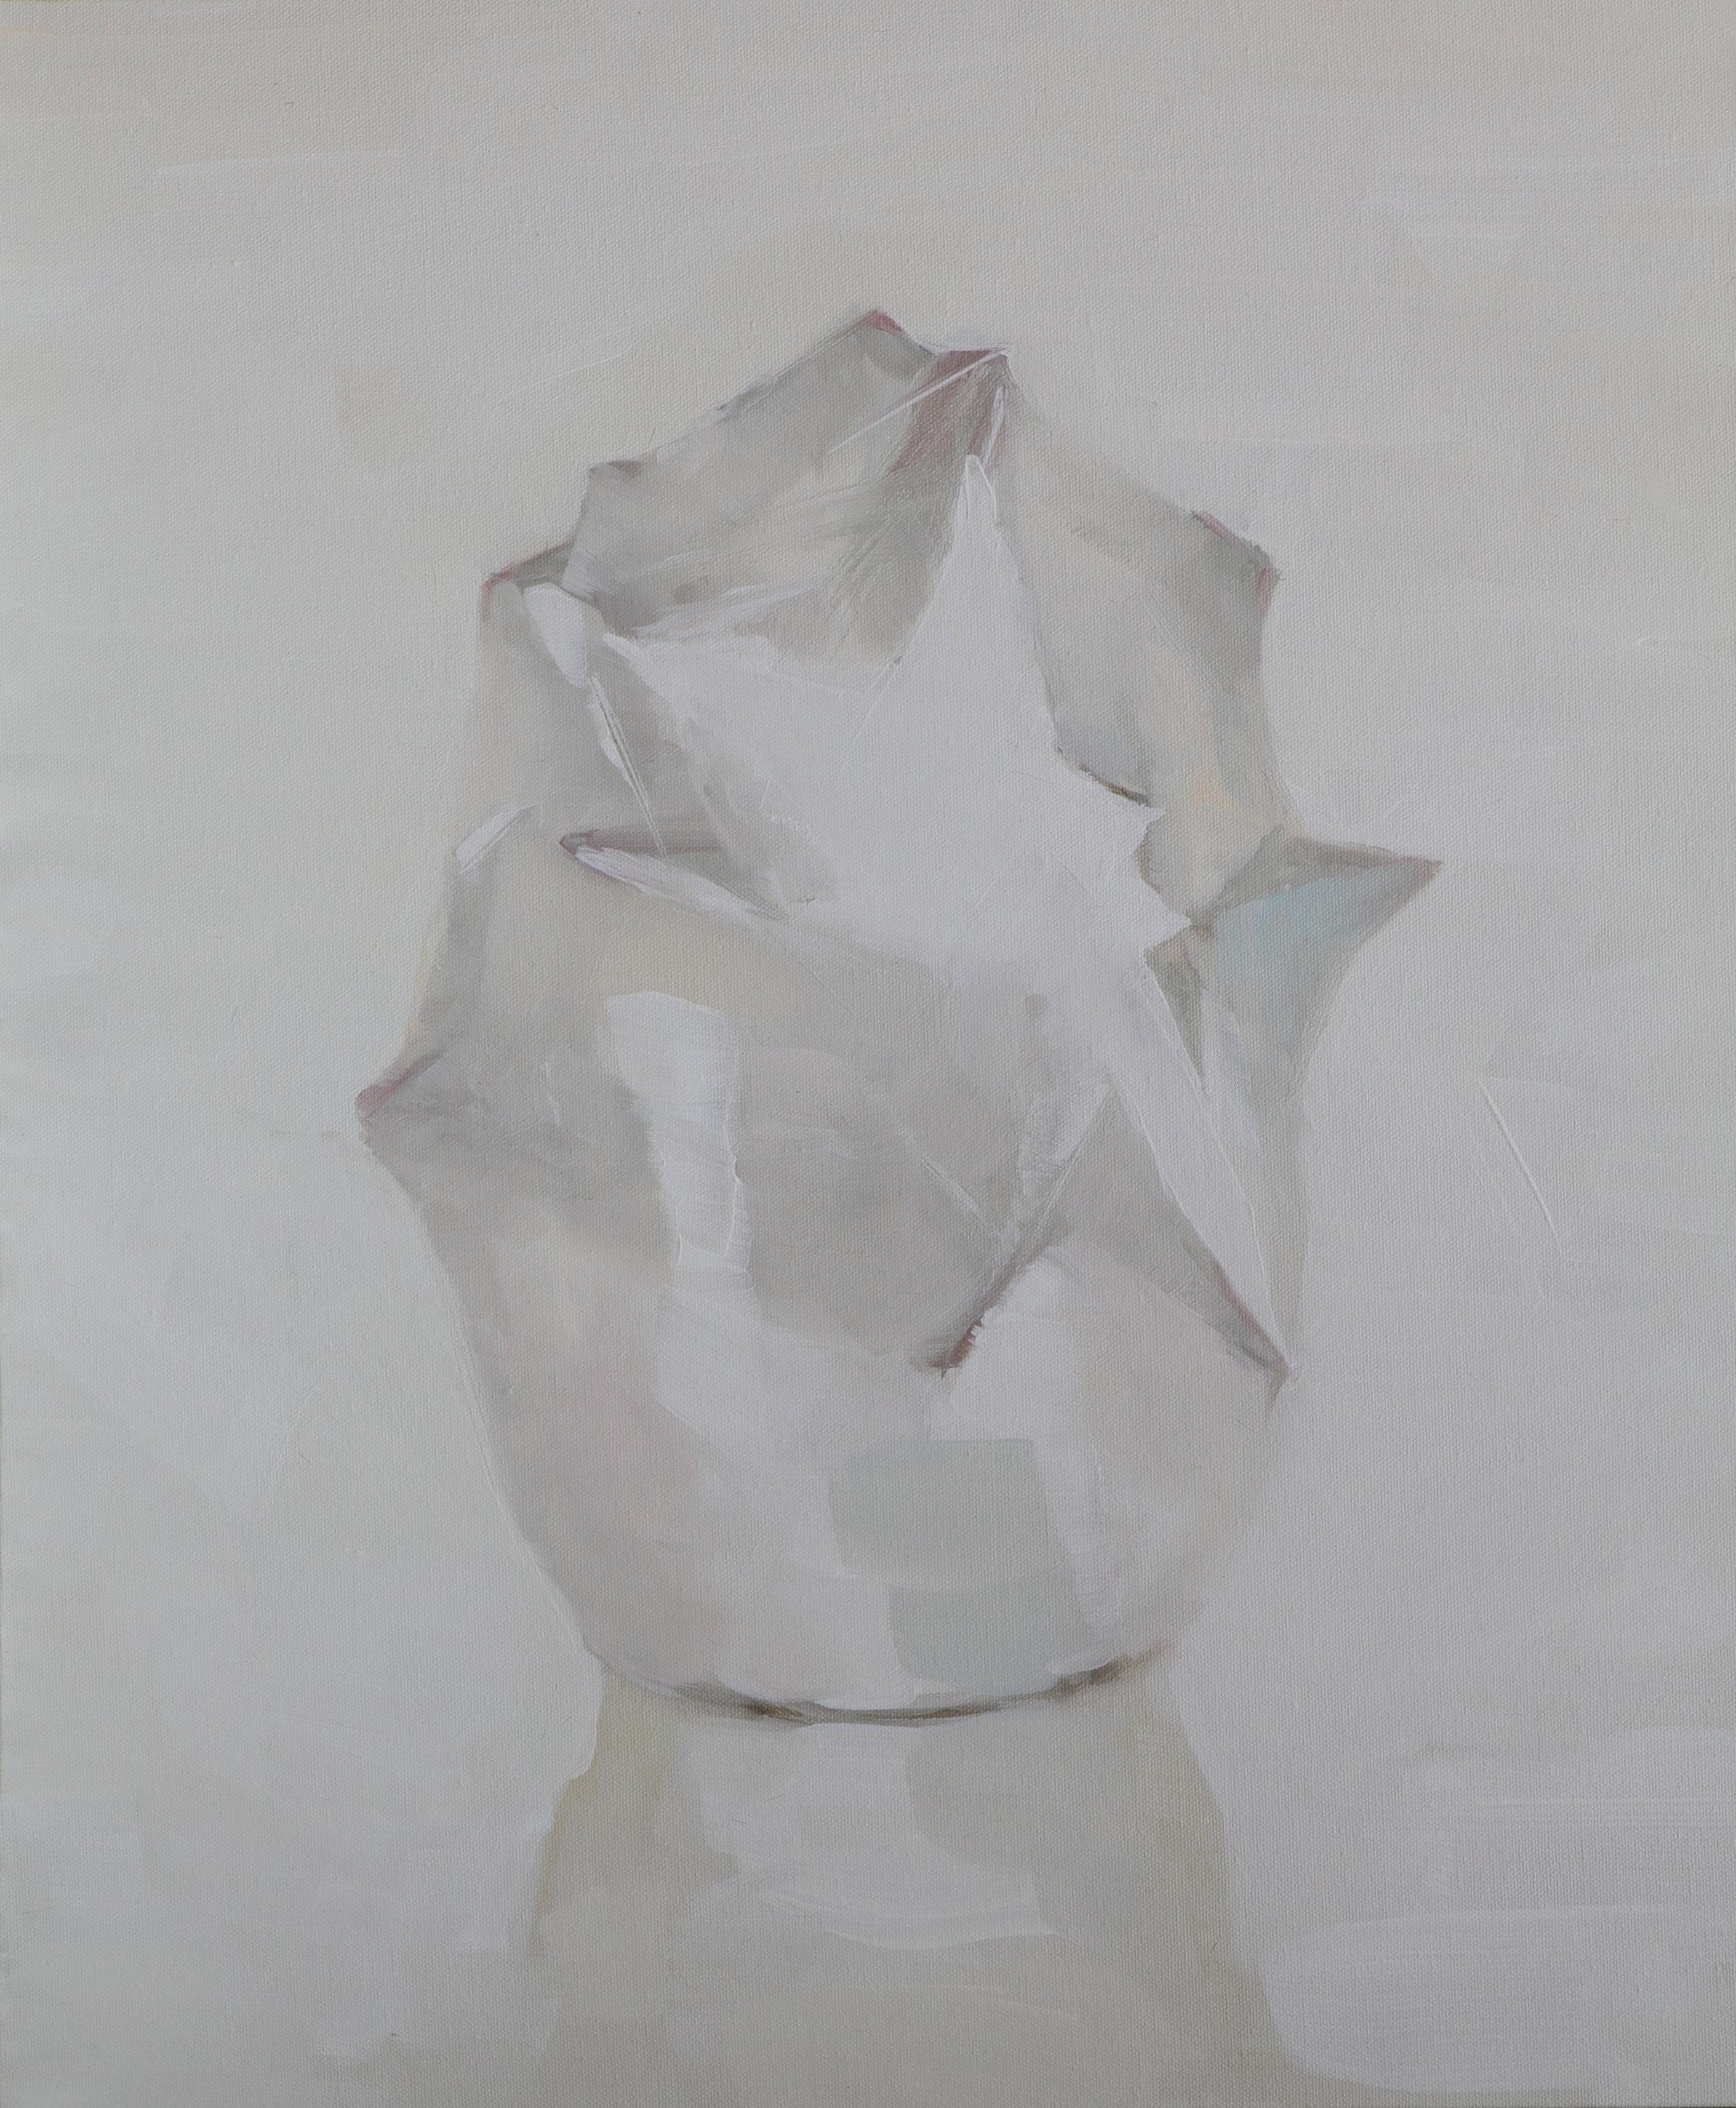 SH1815_Hong Soun_OrdinaryMonument M-1815_oil on canvas_52.5x41cm_2018.JPG